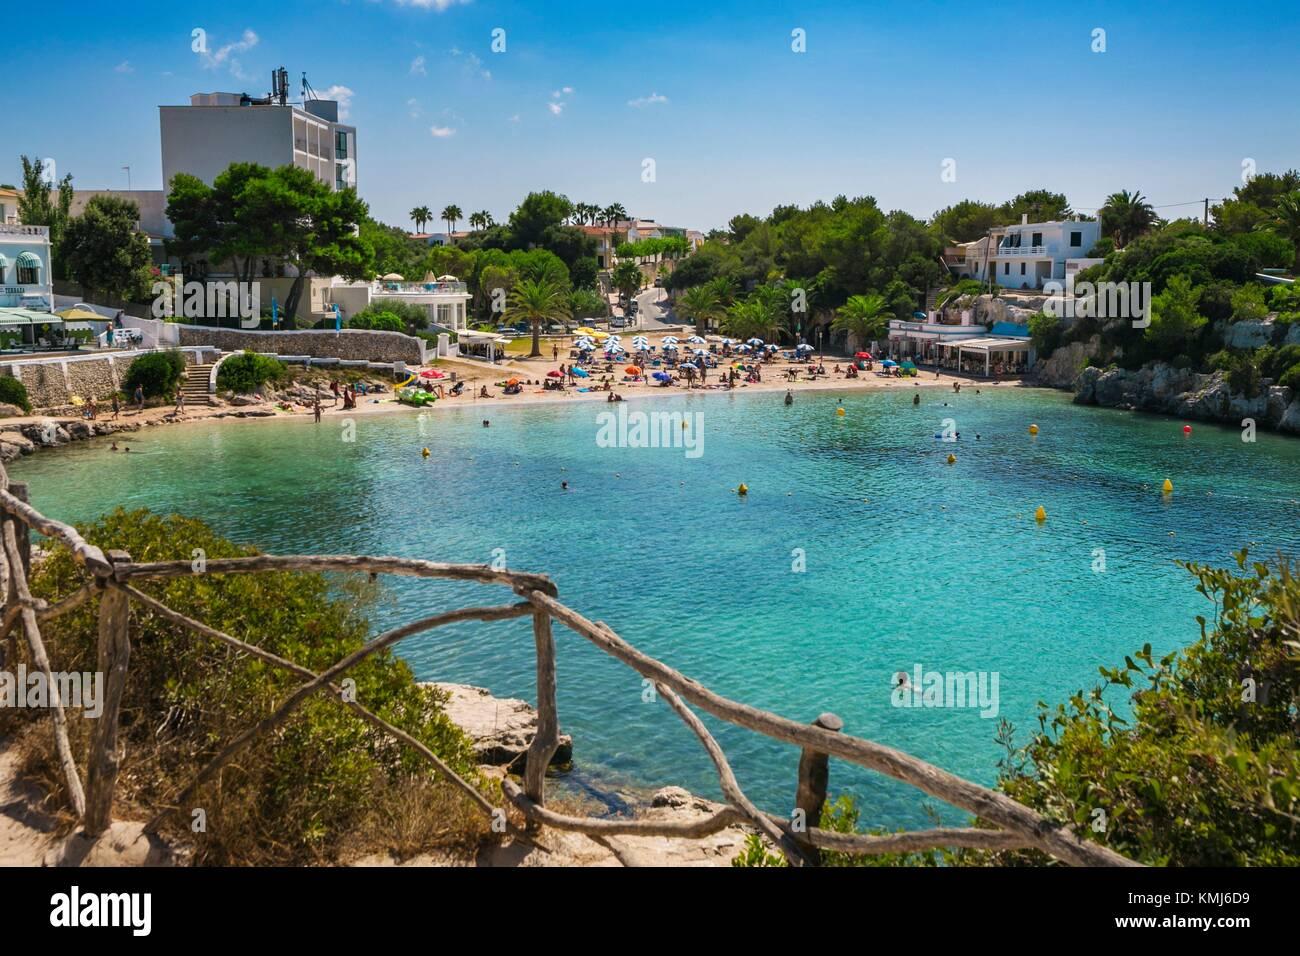 Cala Santandria Beach. Ciutadella de Menorca Municipality. Minorca. Balearic Islands. Spain - Stock Image